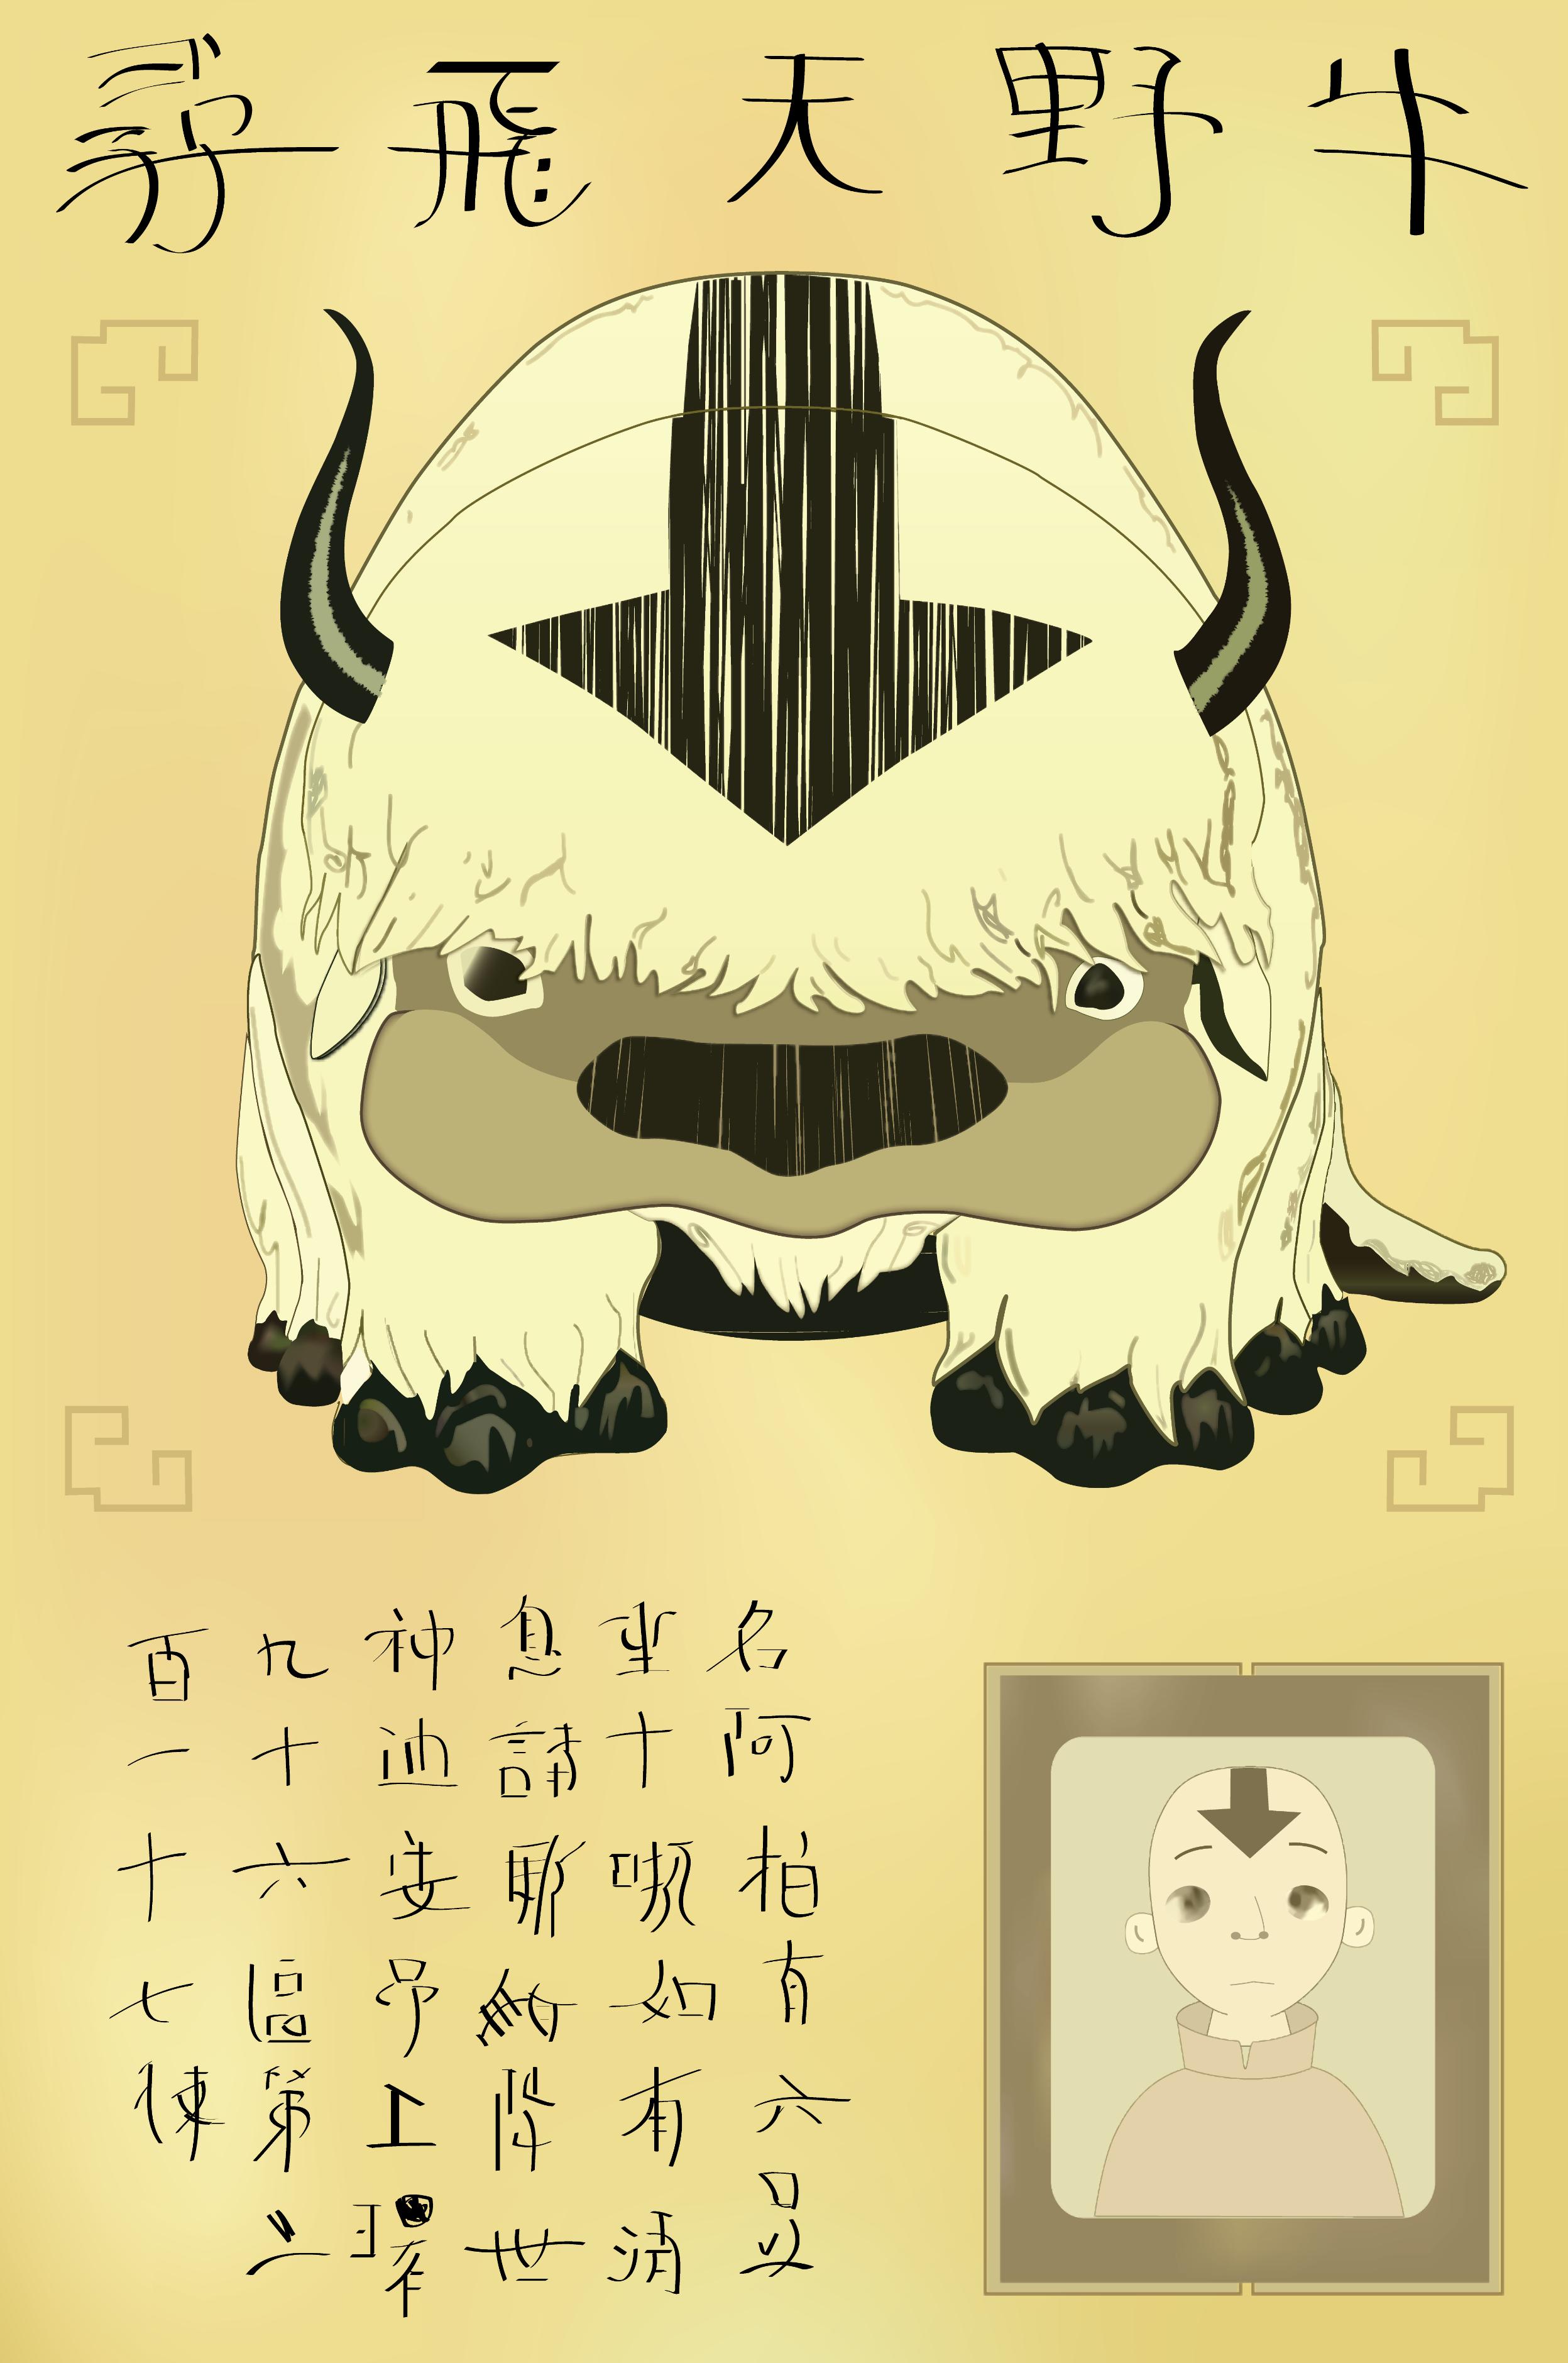 Drawing Illustration Anime Cartoon Avatar The Last Airbender Appa Sketch Font